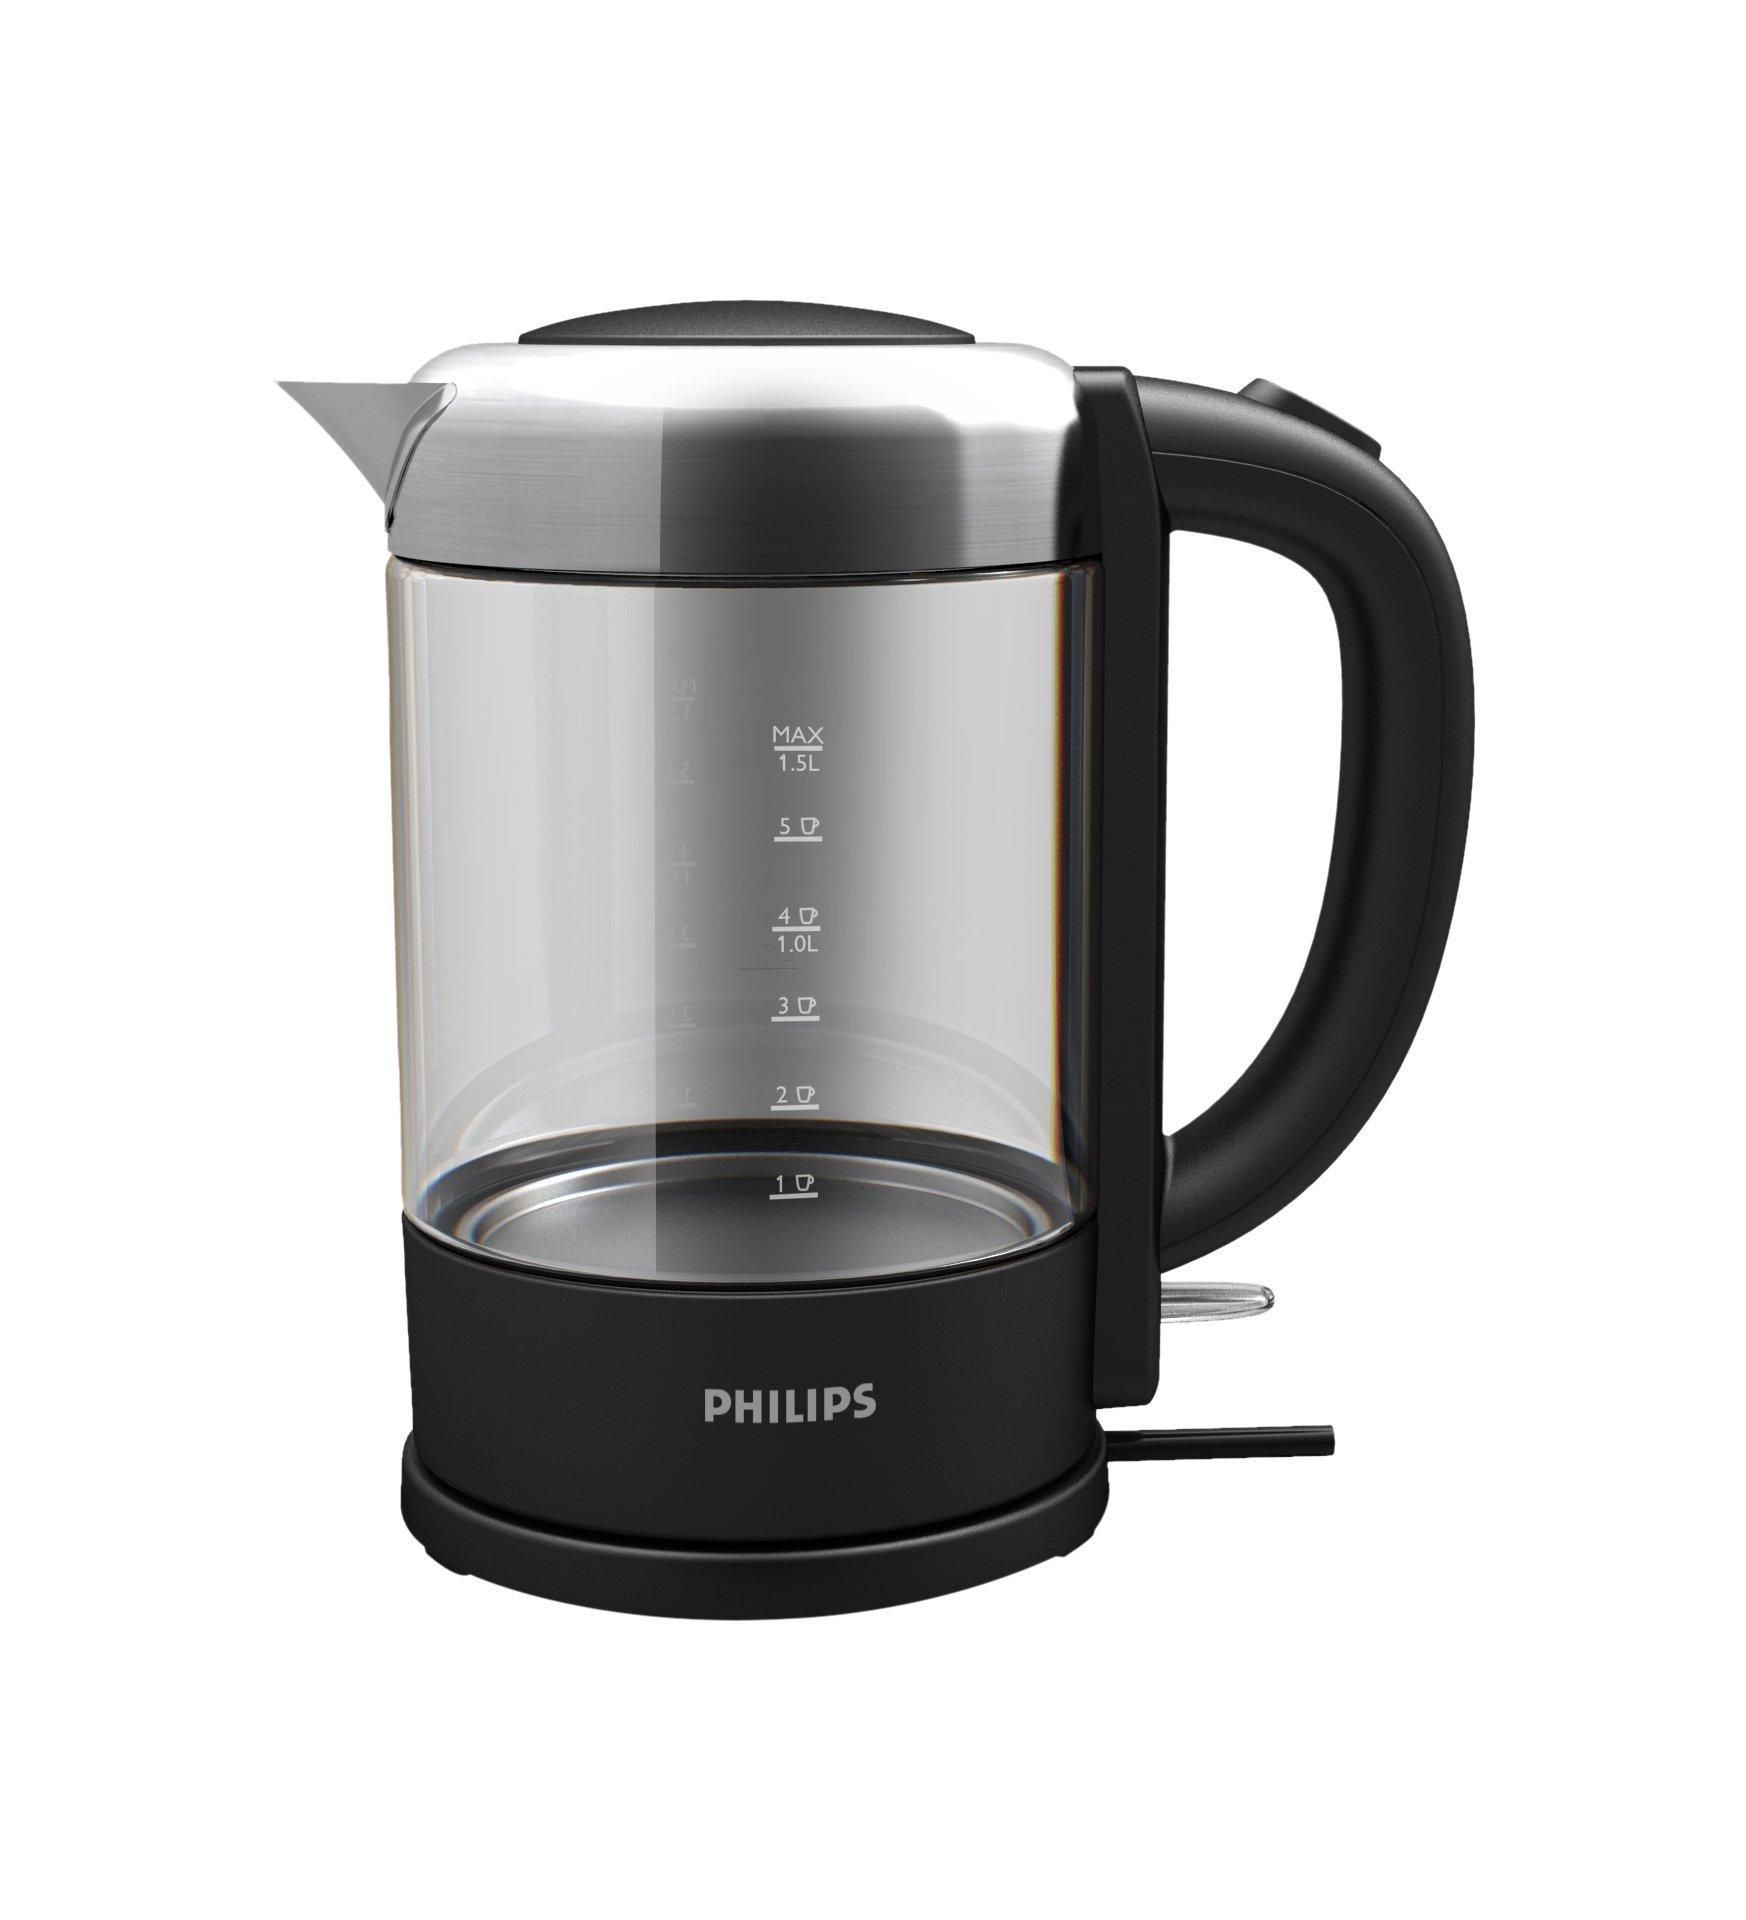 philips hd9340 90 glass kettle 2200 w 1 5 litre new ebay. Black Bedroom Furniture Sets. Home Design Ideas